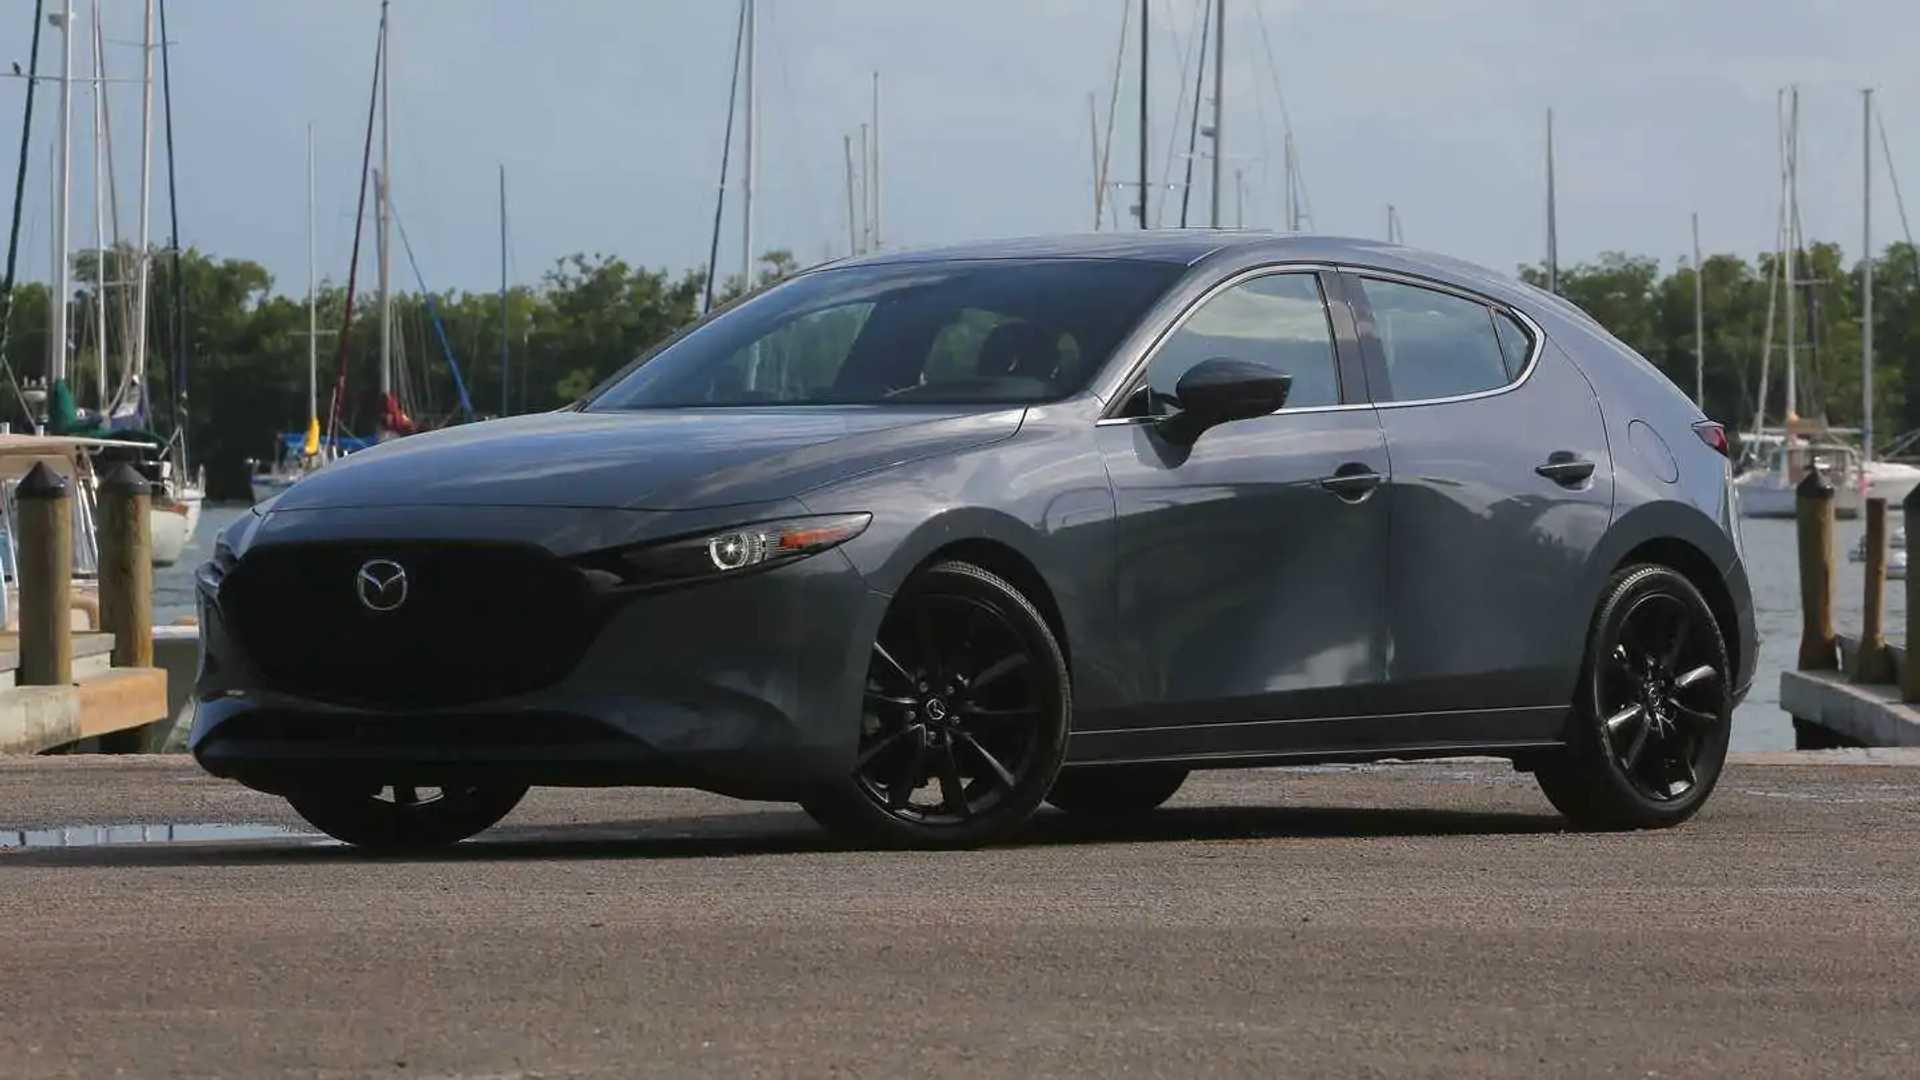 Kelebihan Kekurangan Mazda3 2020 Review